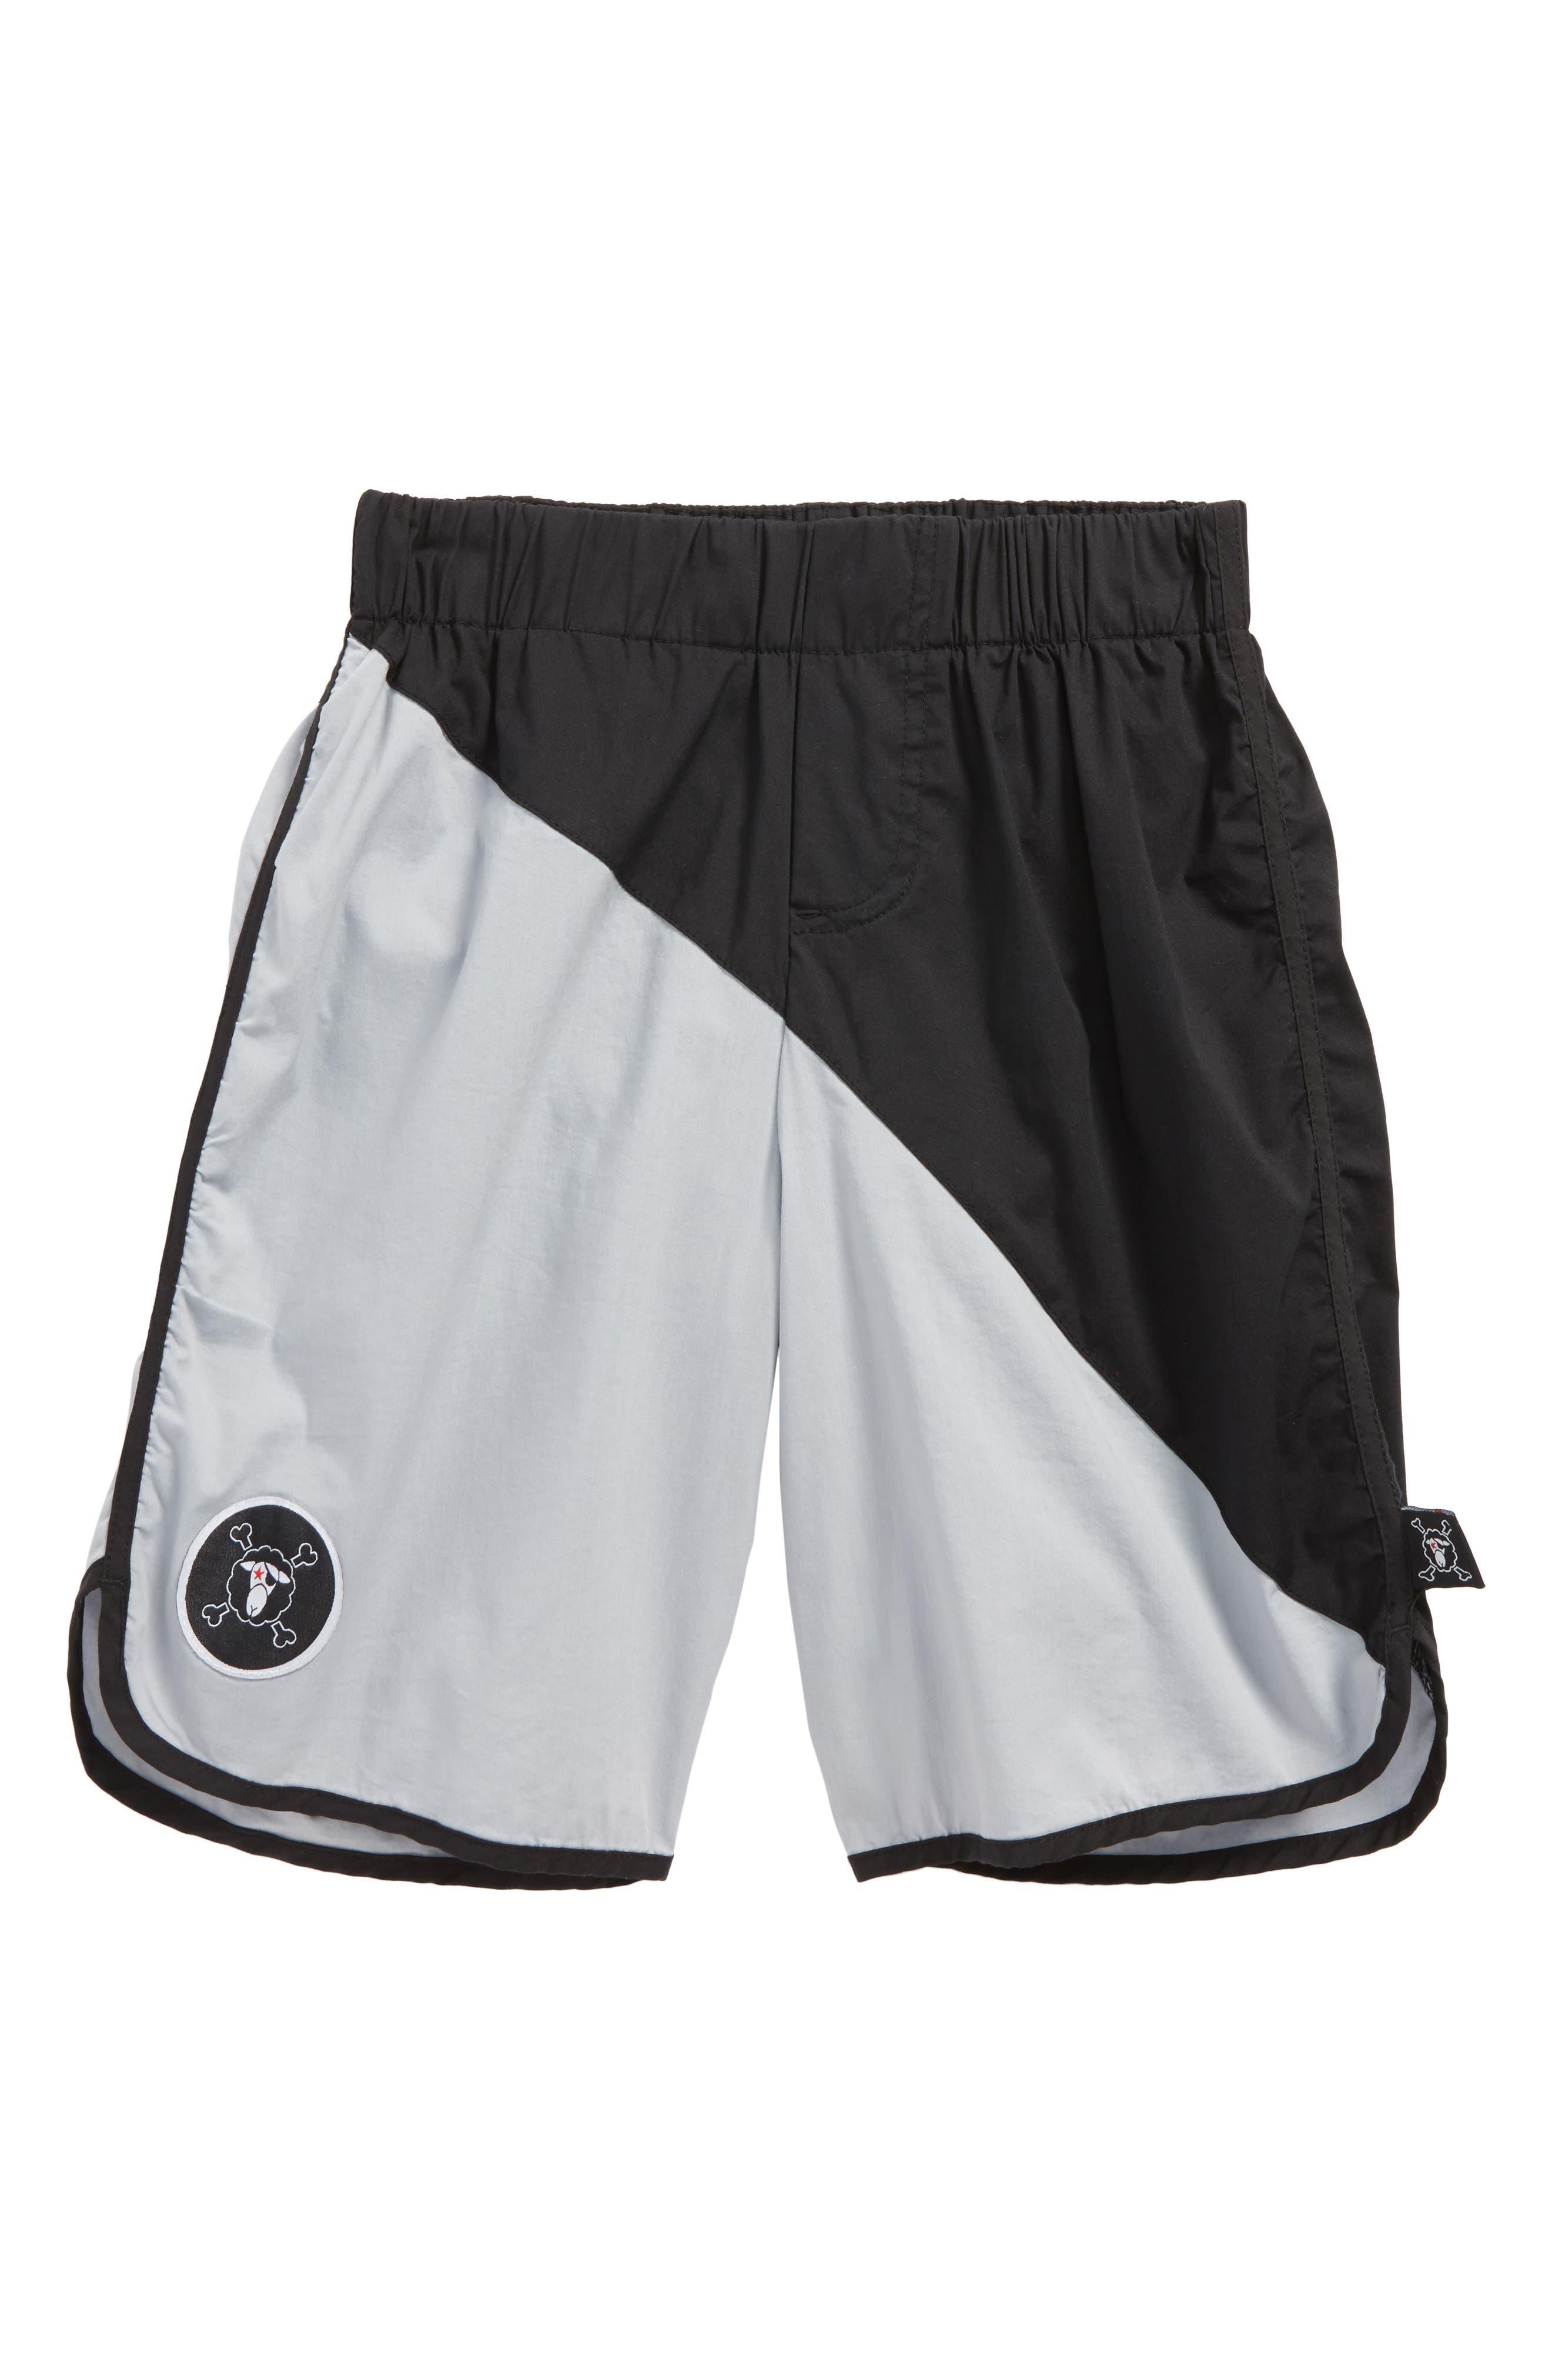 Colorblock Board Shorts,                             Main thumbnail 1, color,                             Black/ Light Grey